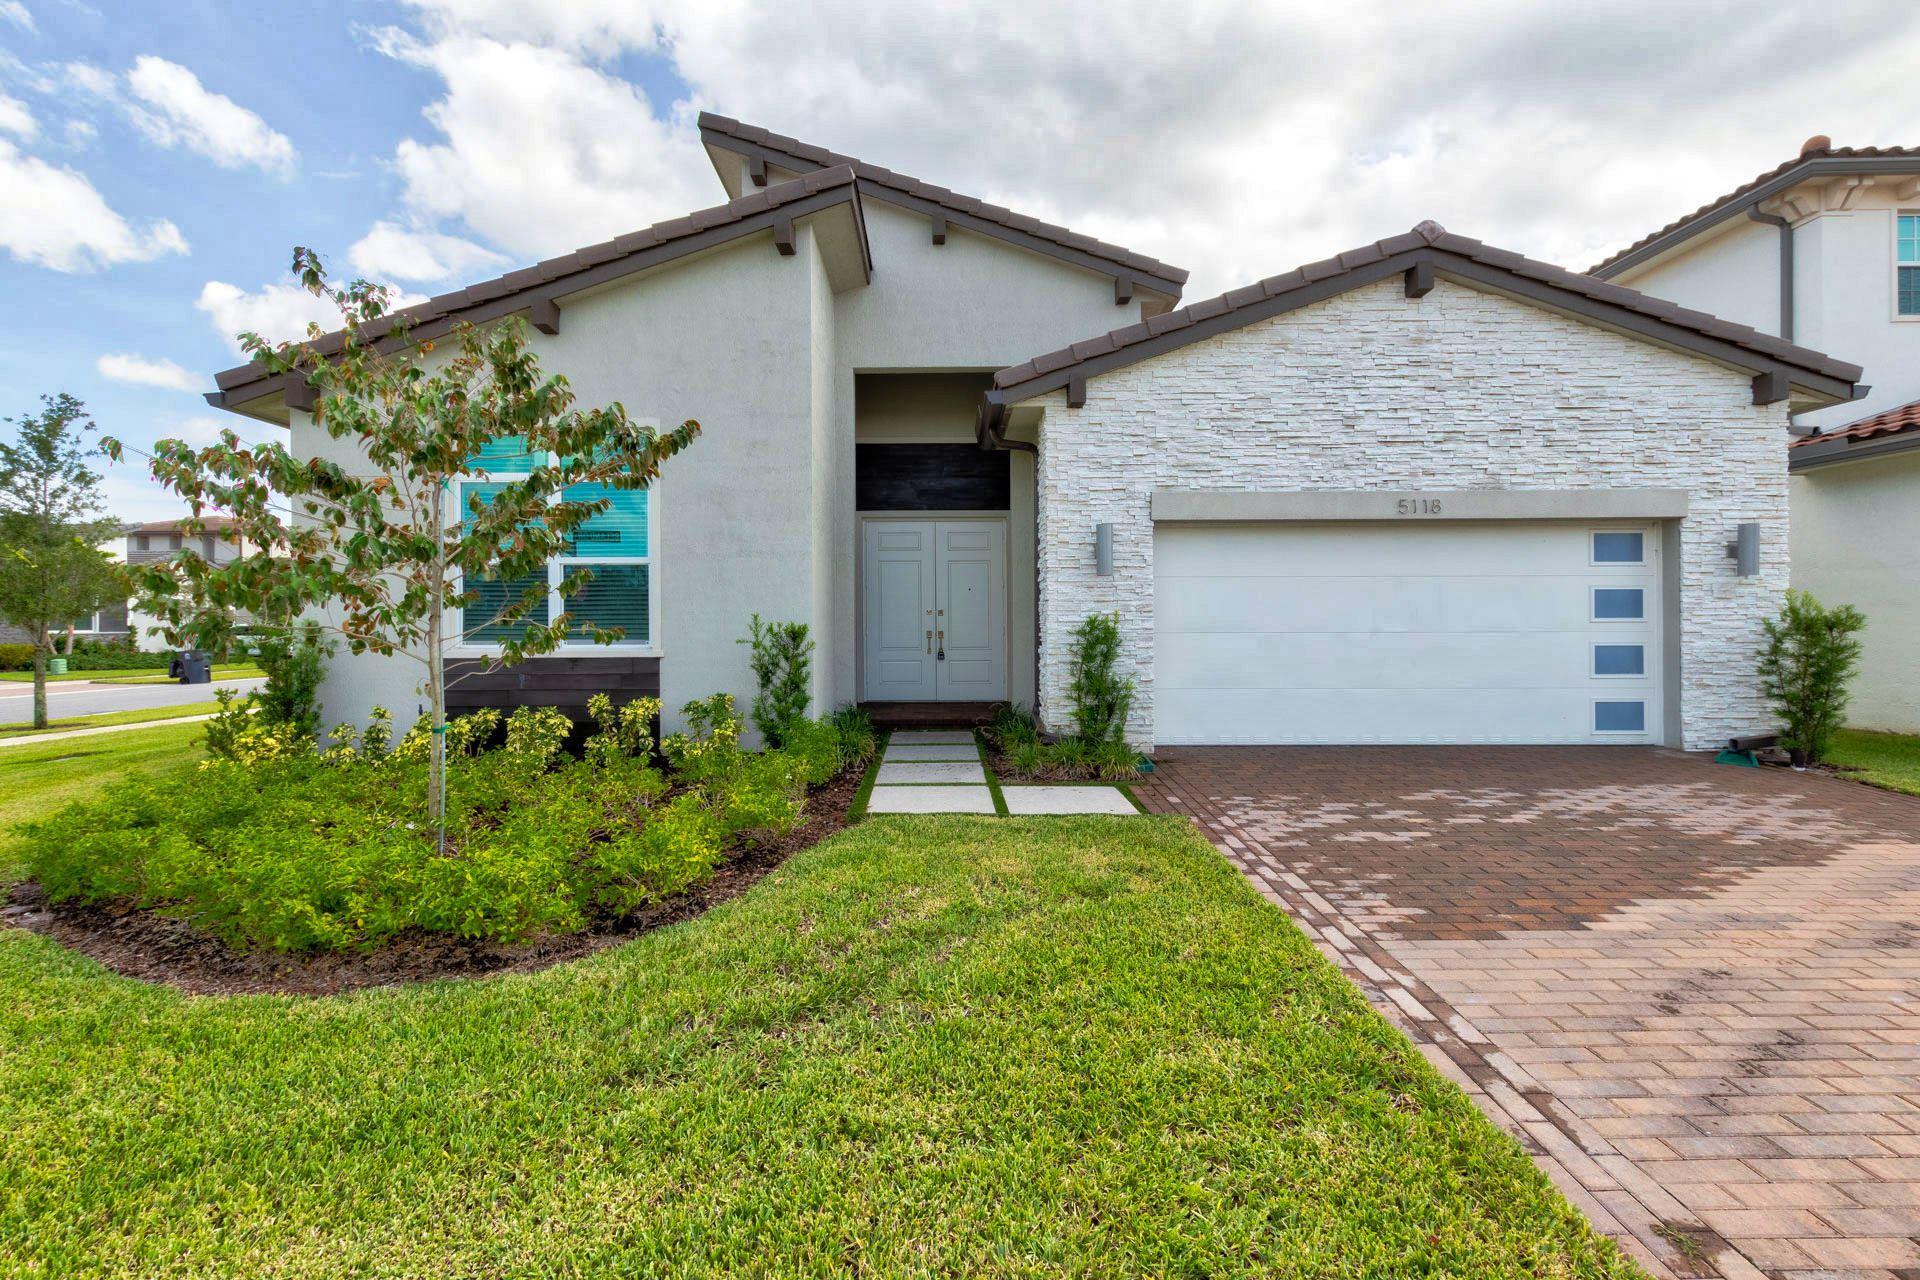 5118 Beland Drive, Lake Worth, FL 33467 - #: RX-10652019